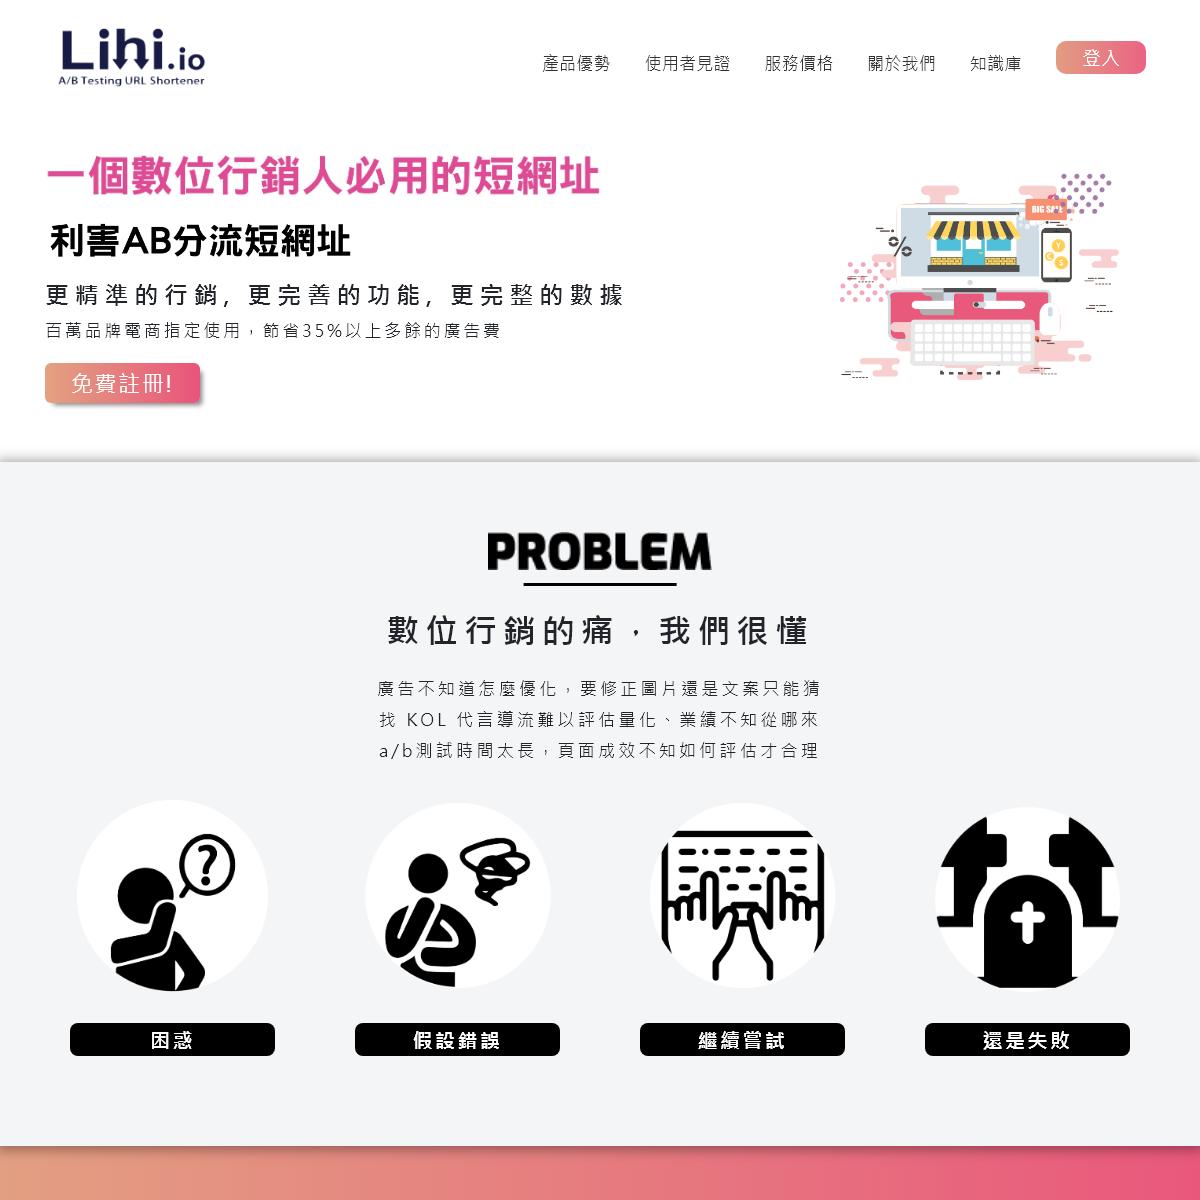 lihi.io – AB 分流短網址